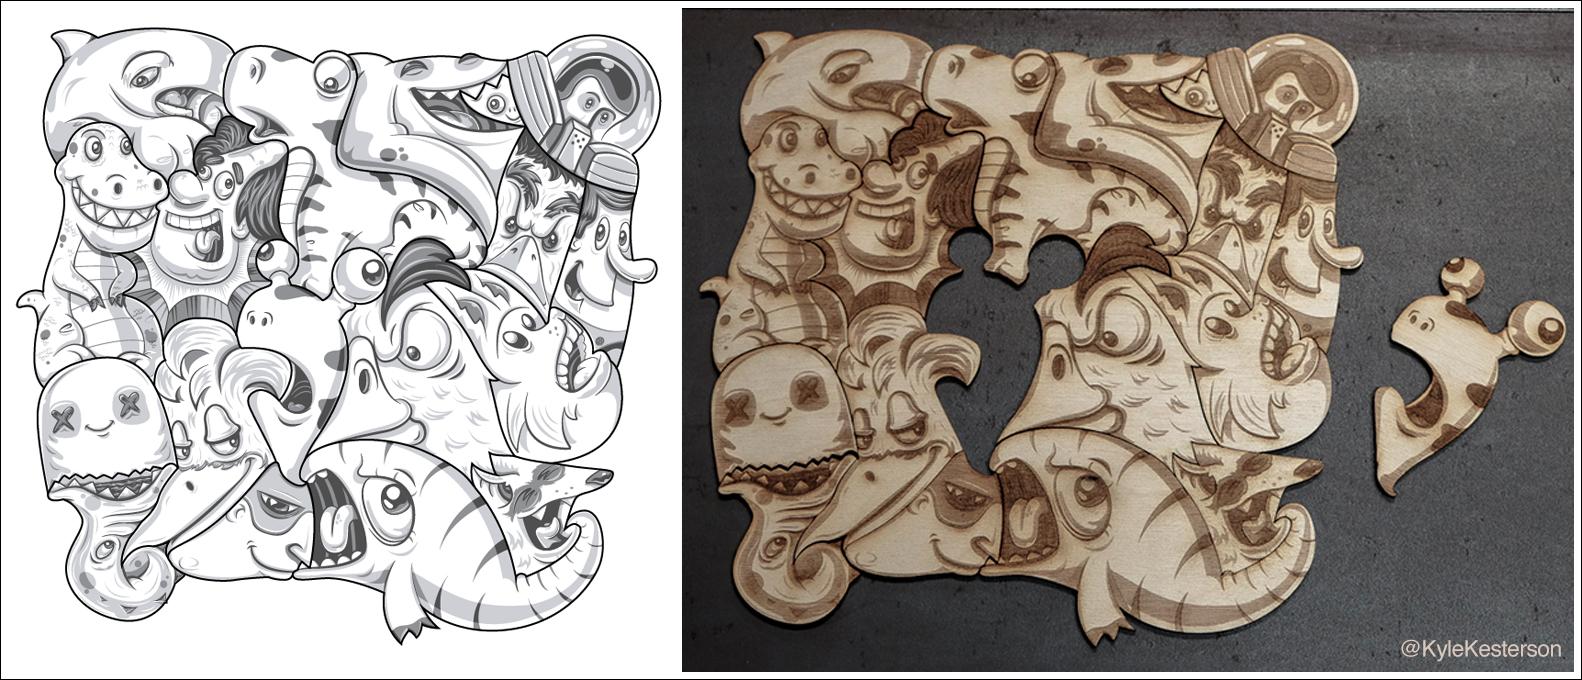 craft_intripuzzle_comparison.jpg